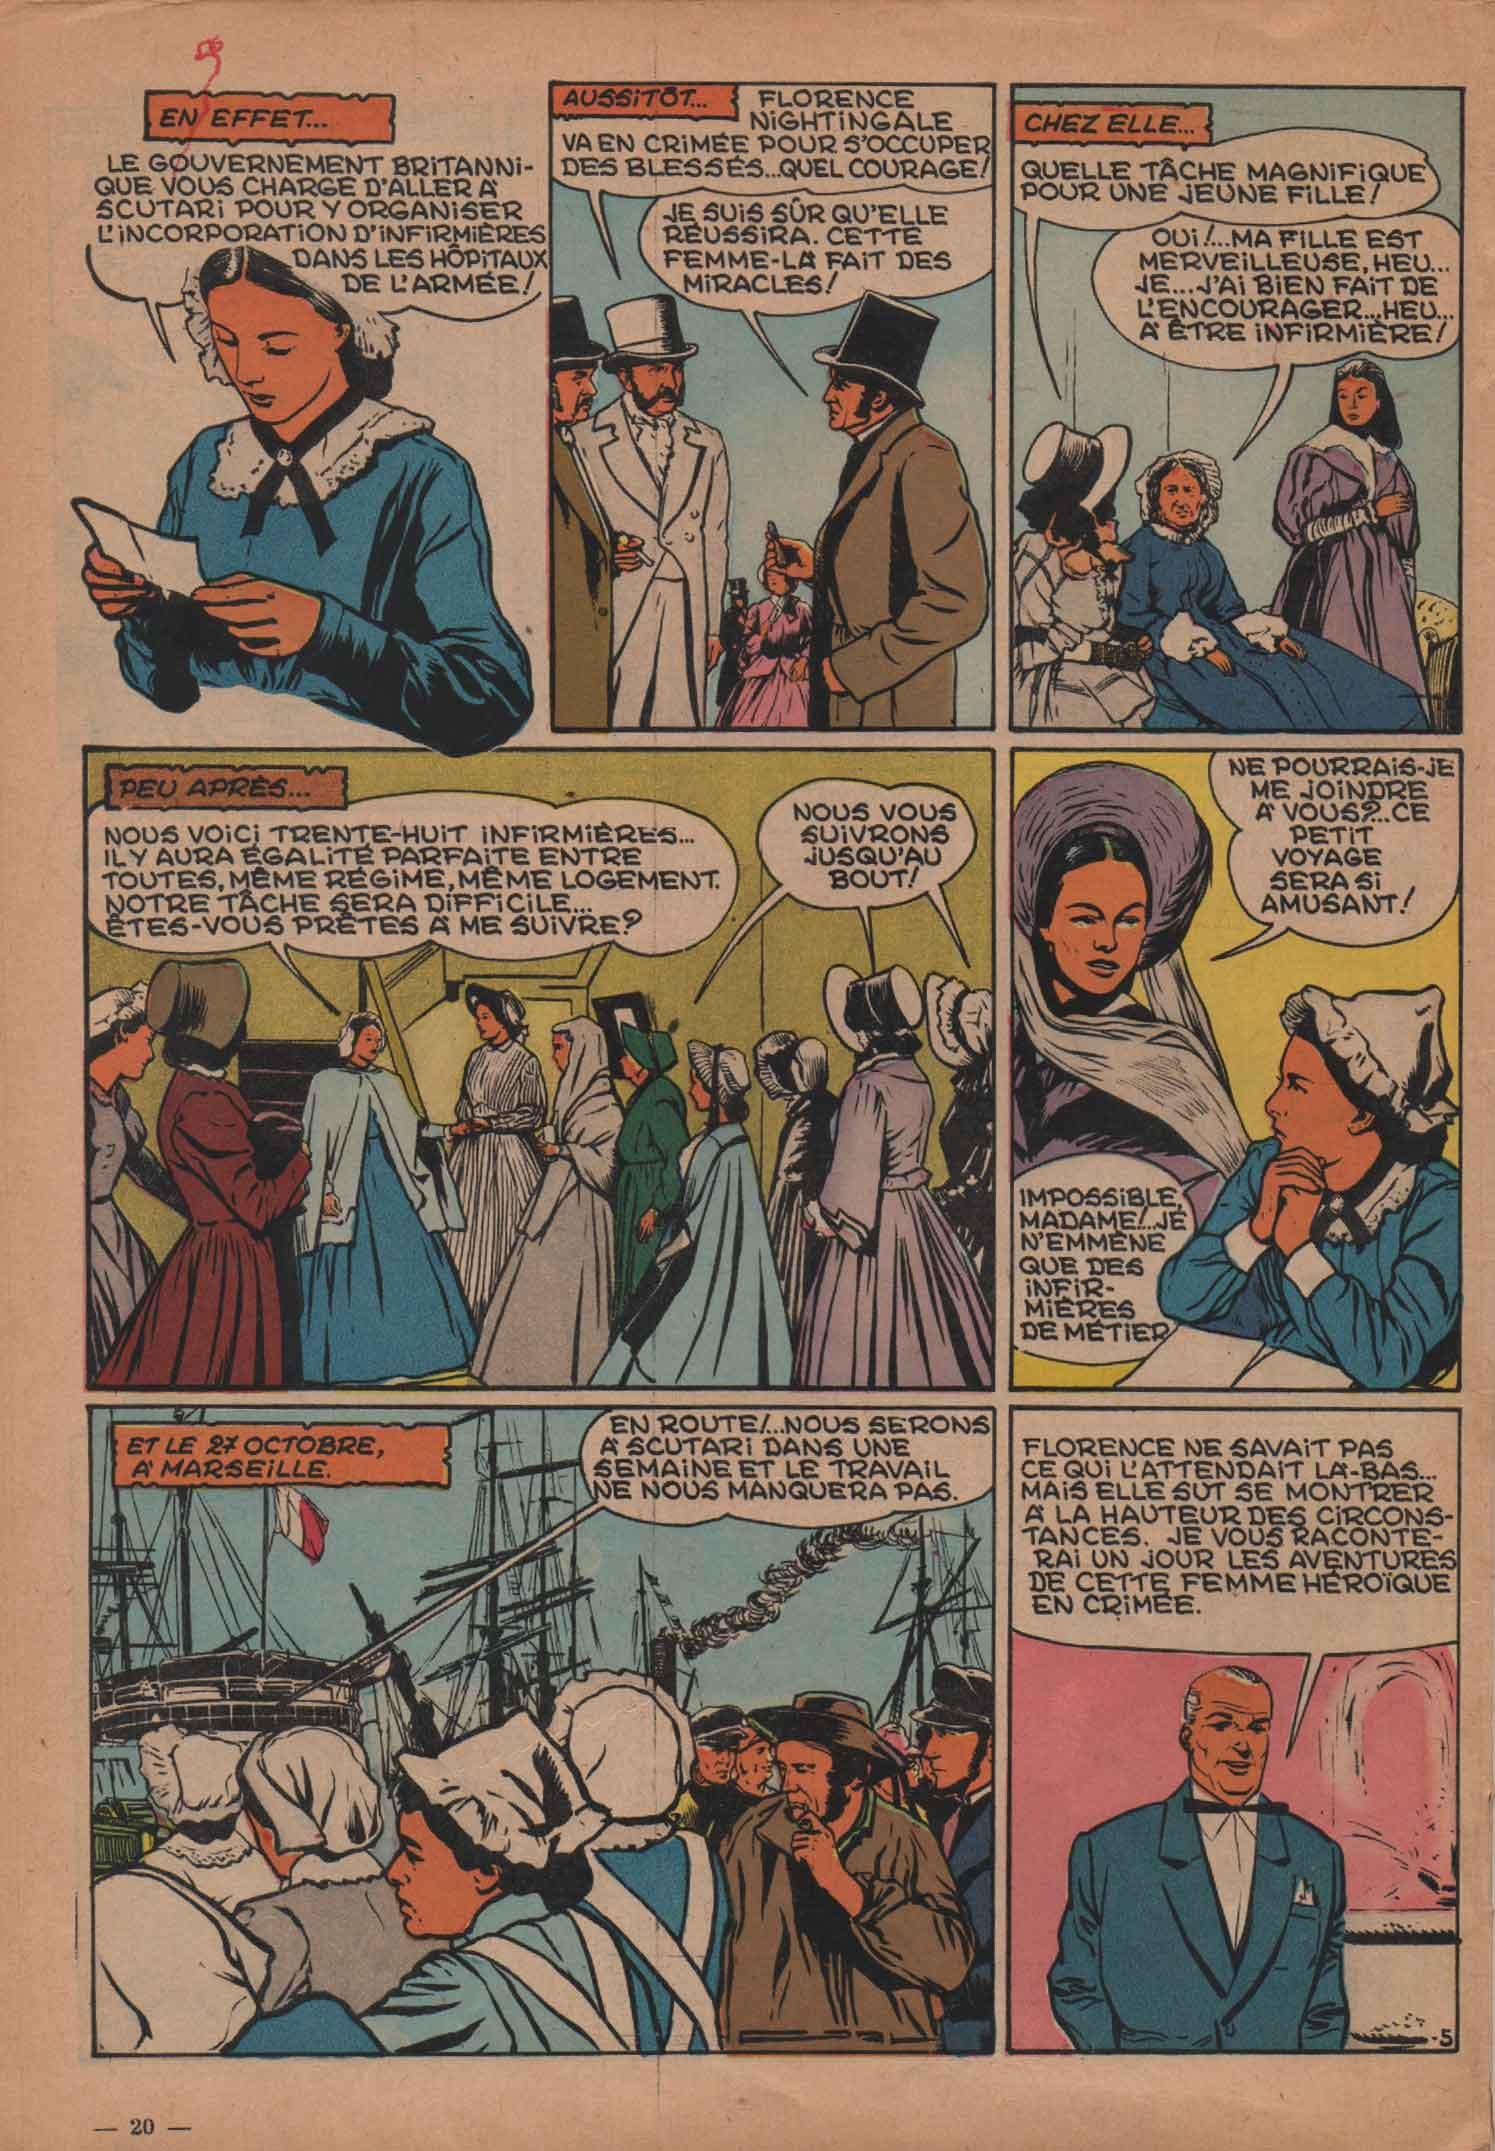 « Florence Nightingale » Spirou n° 903 (04/08/1955).